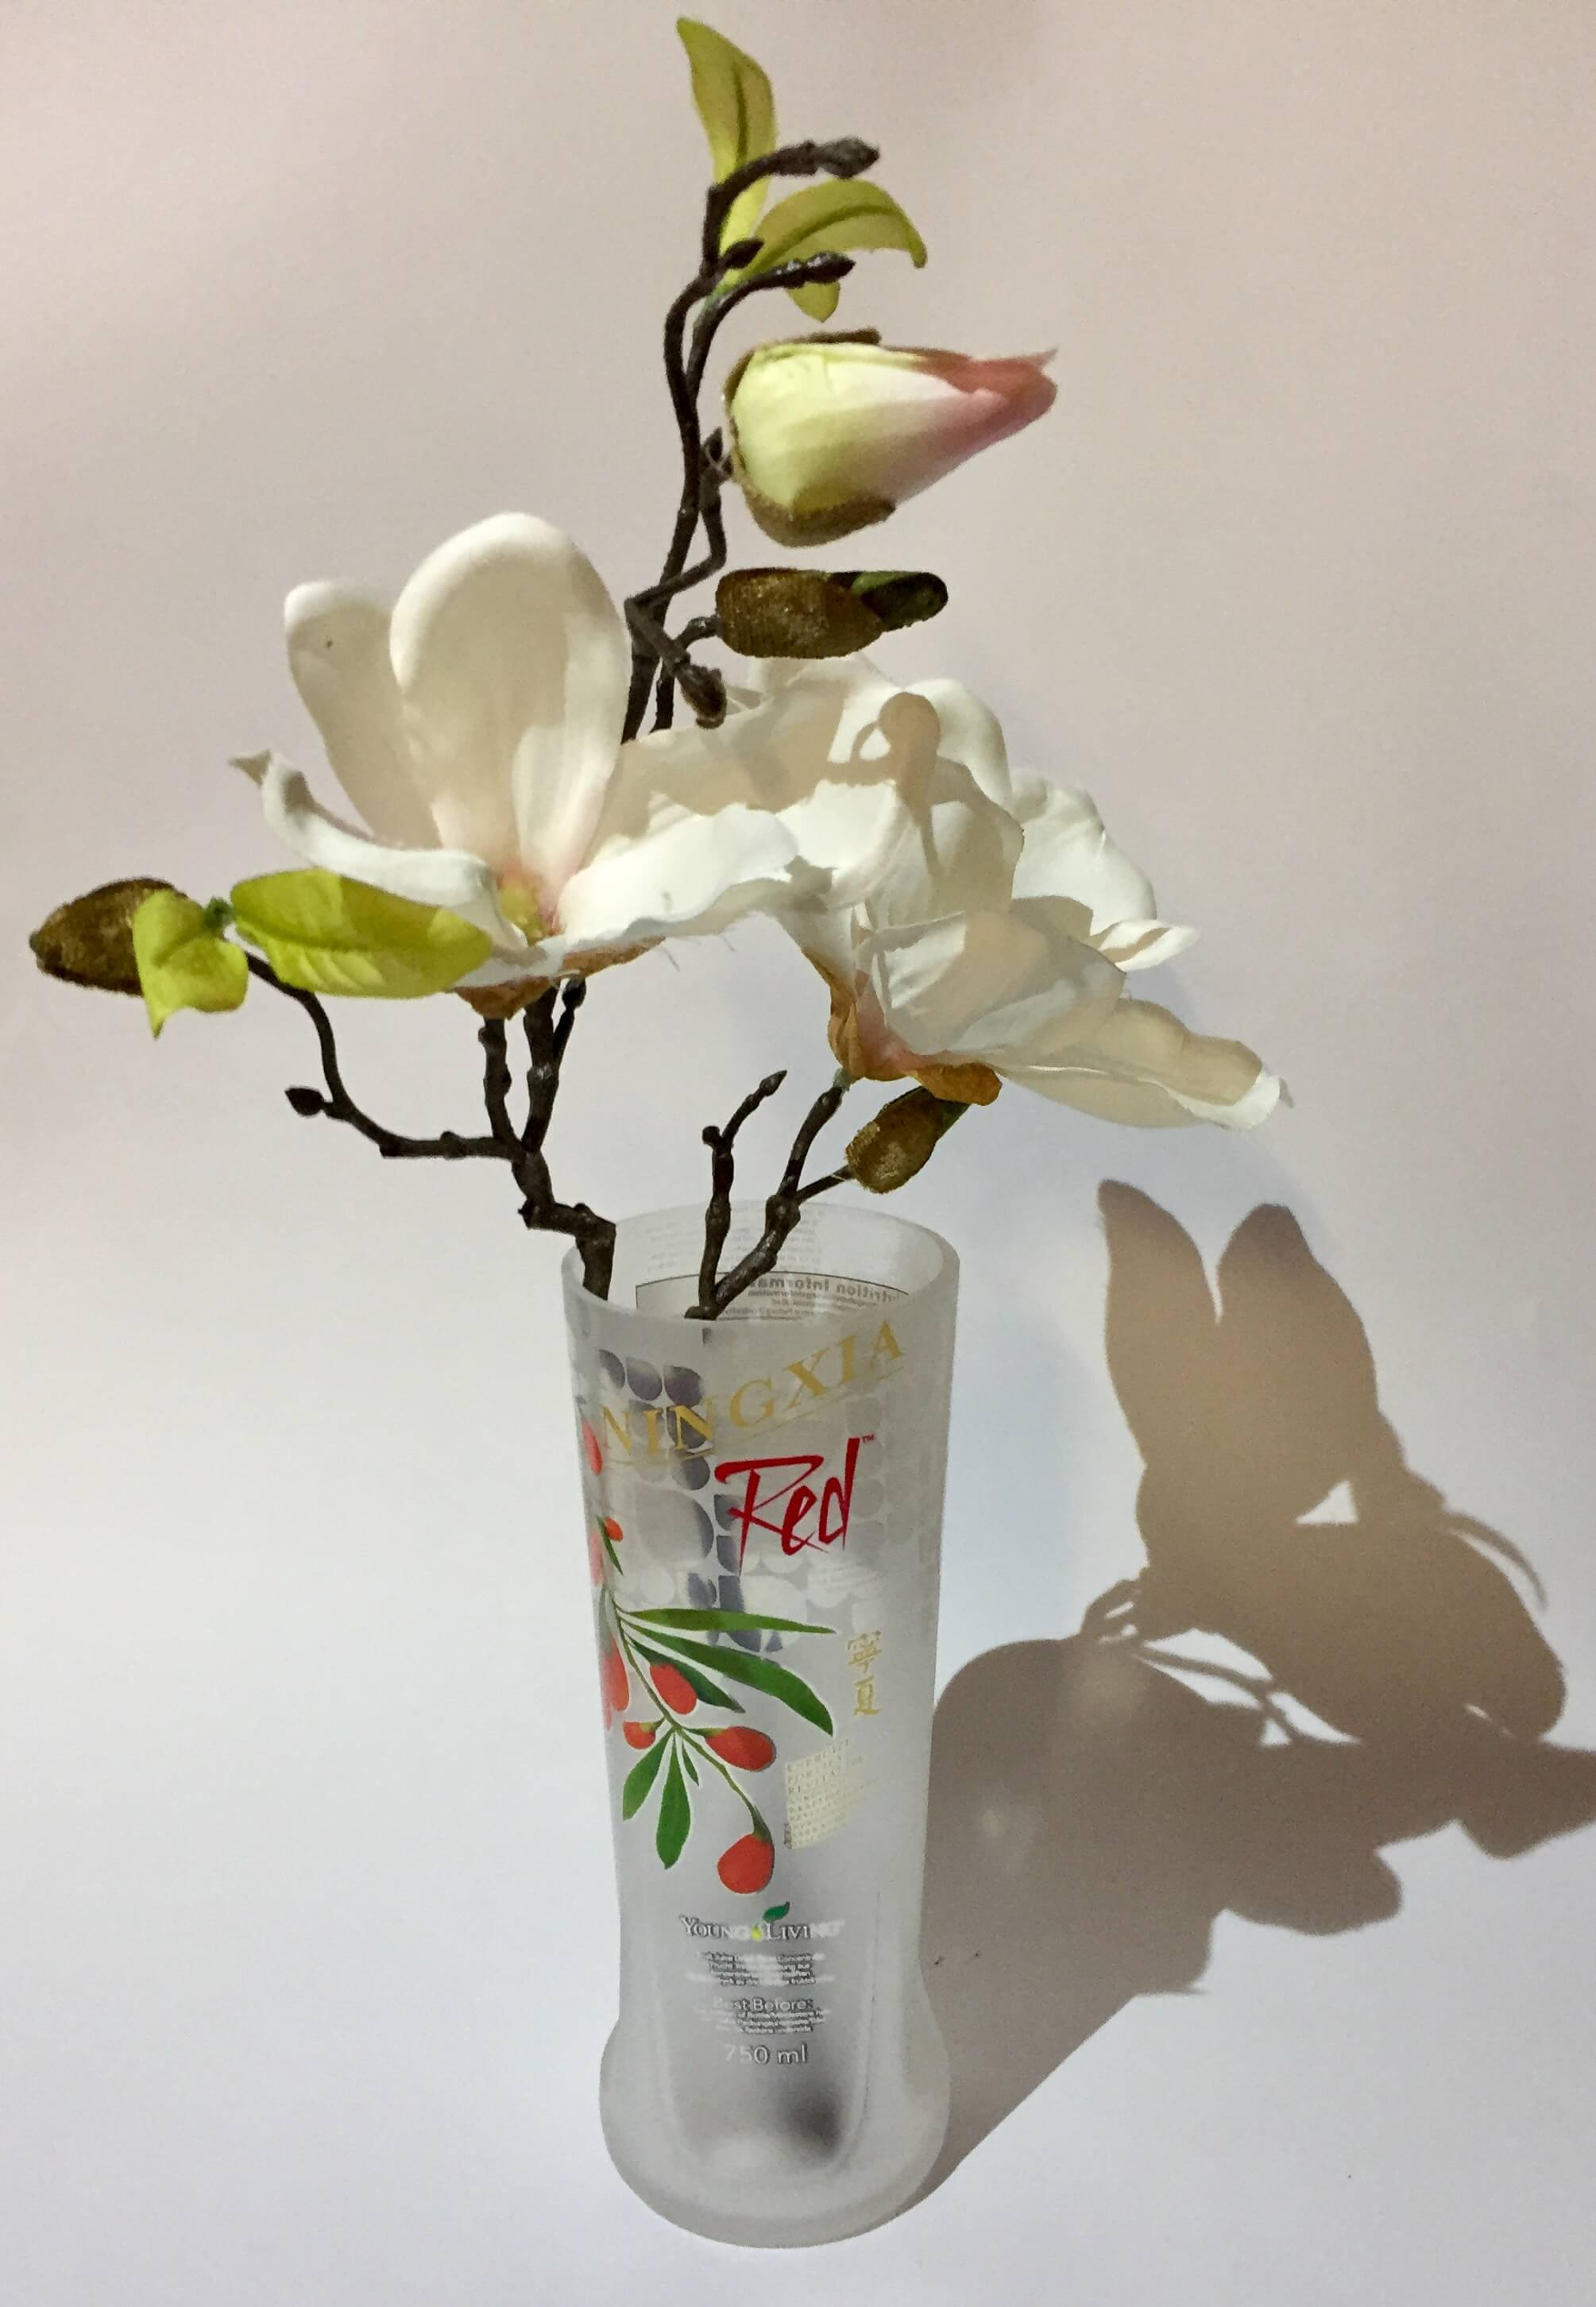 Ningxia Red Vase Deko 2 Stück